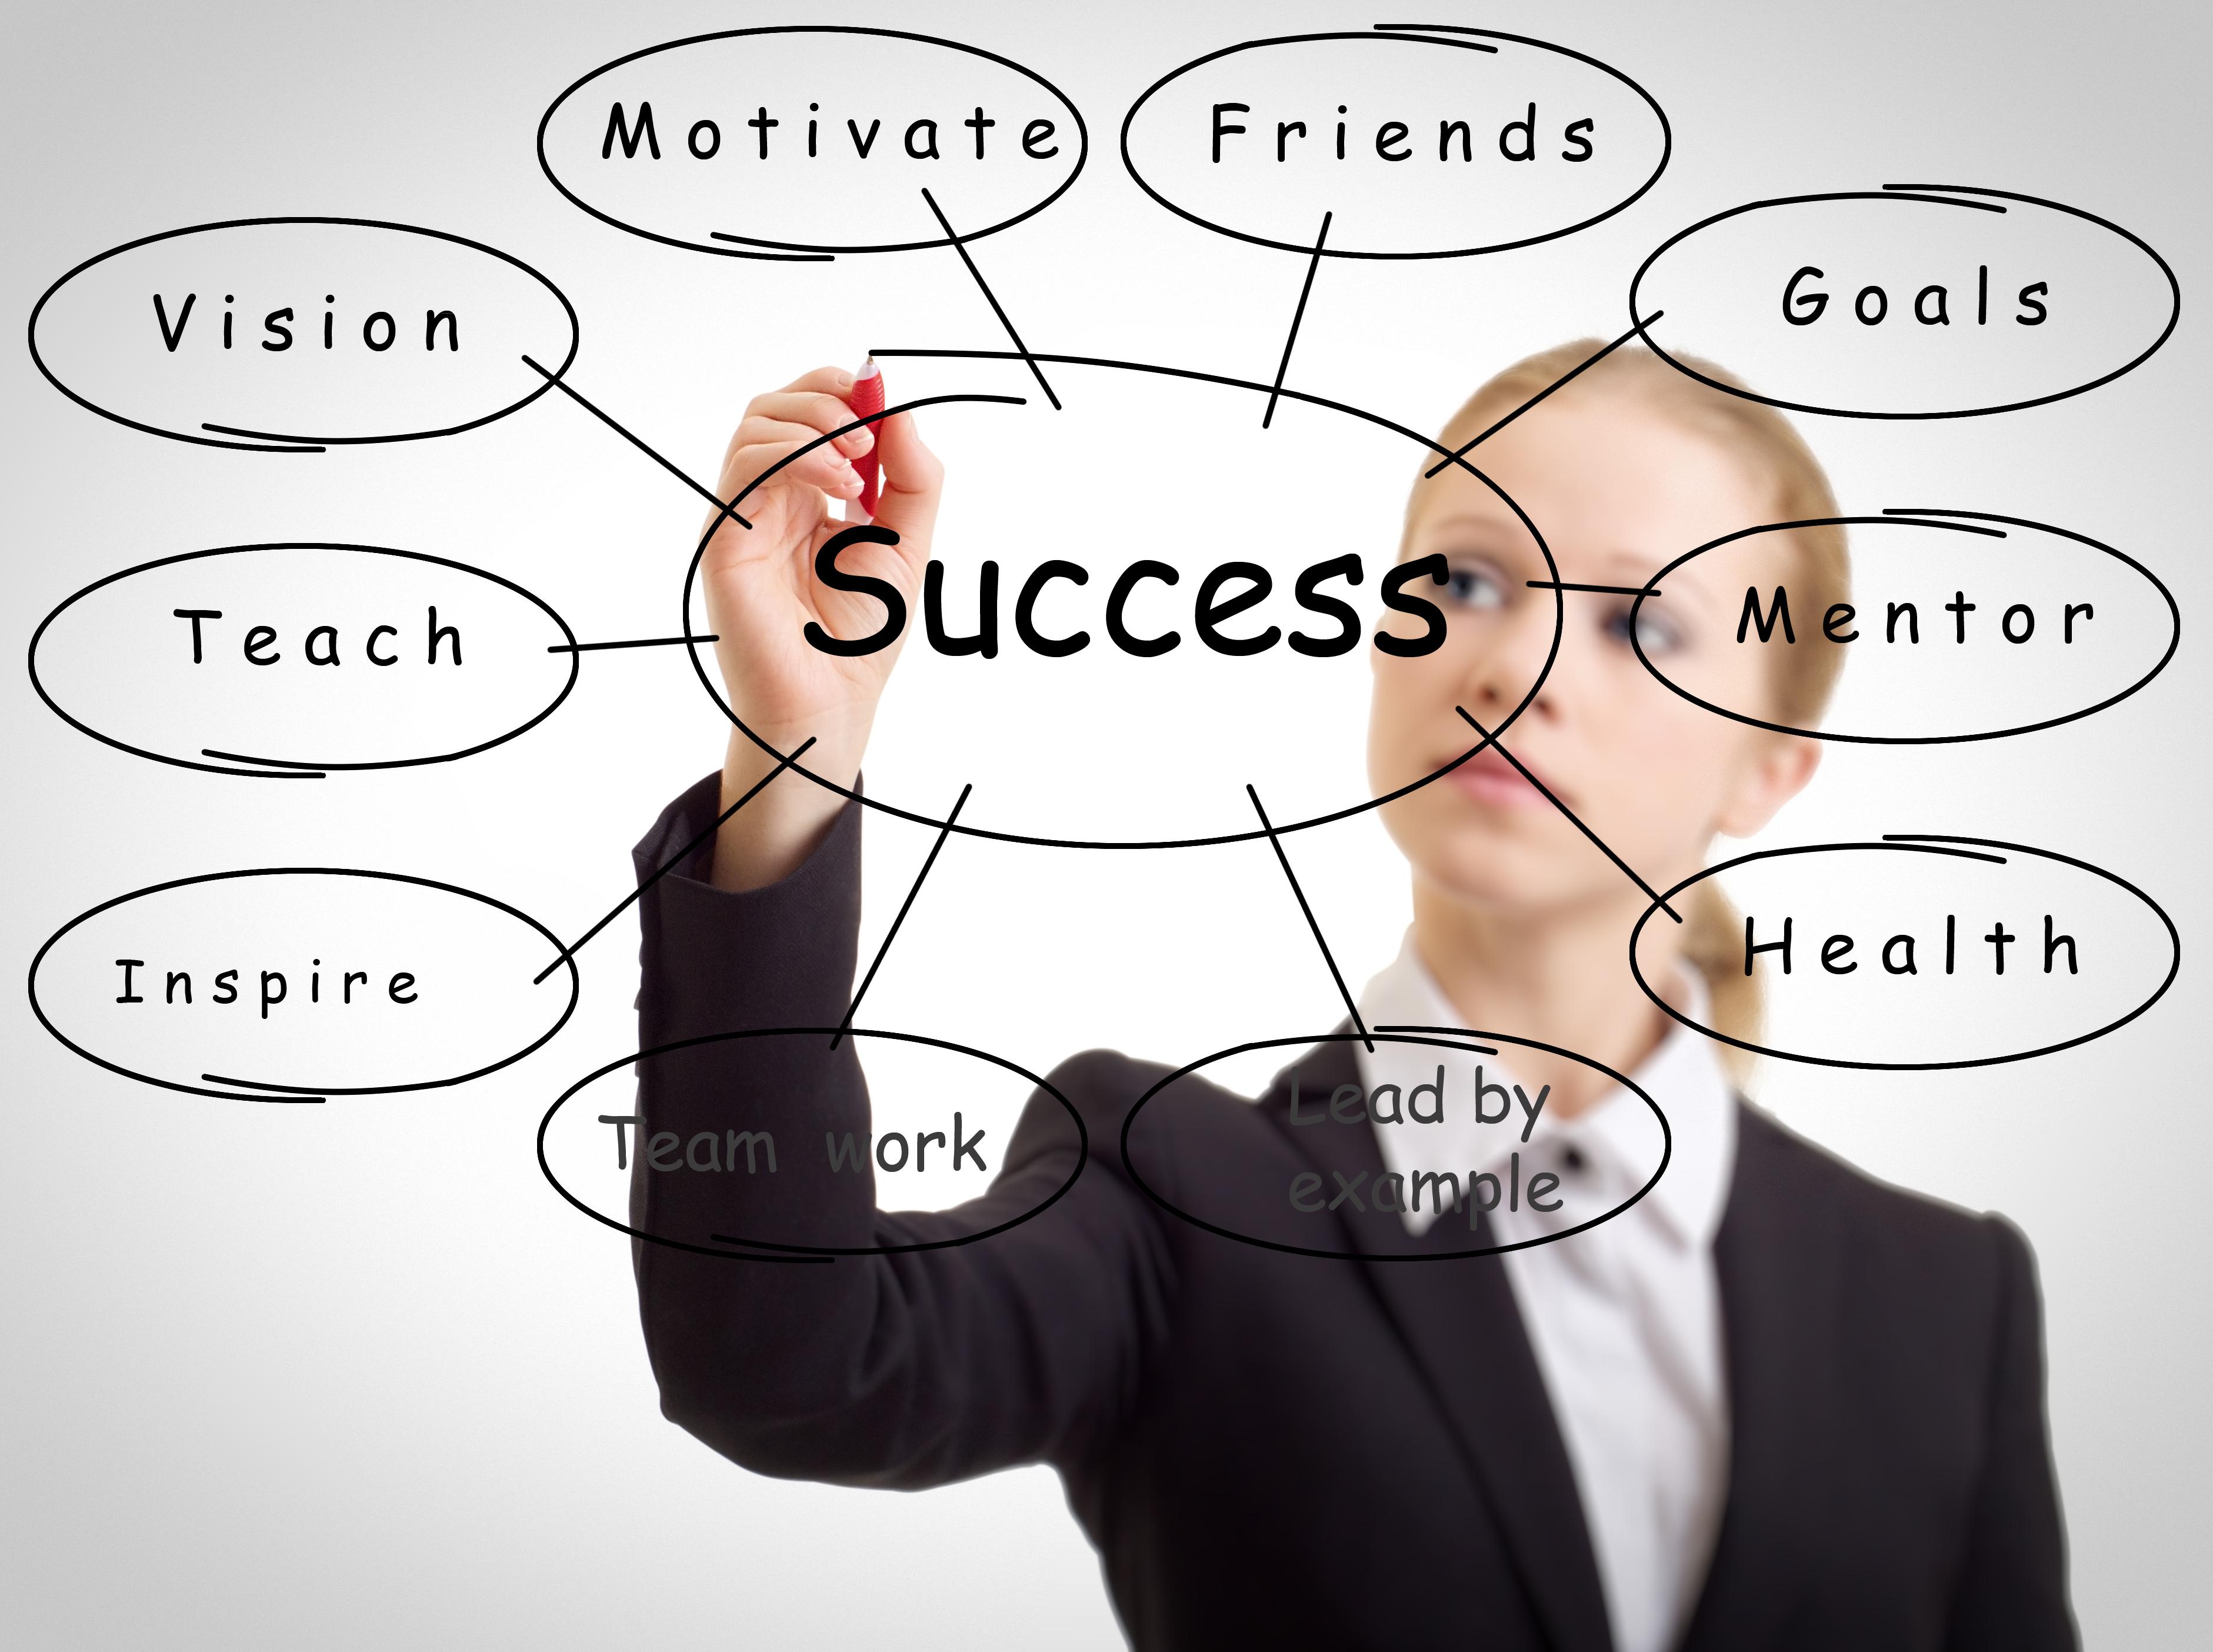 Richard Vanderhurst - The Joy Of Article Marketing Tips And Advice